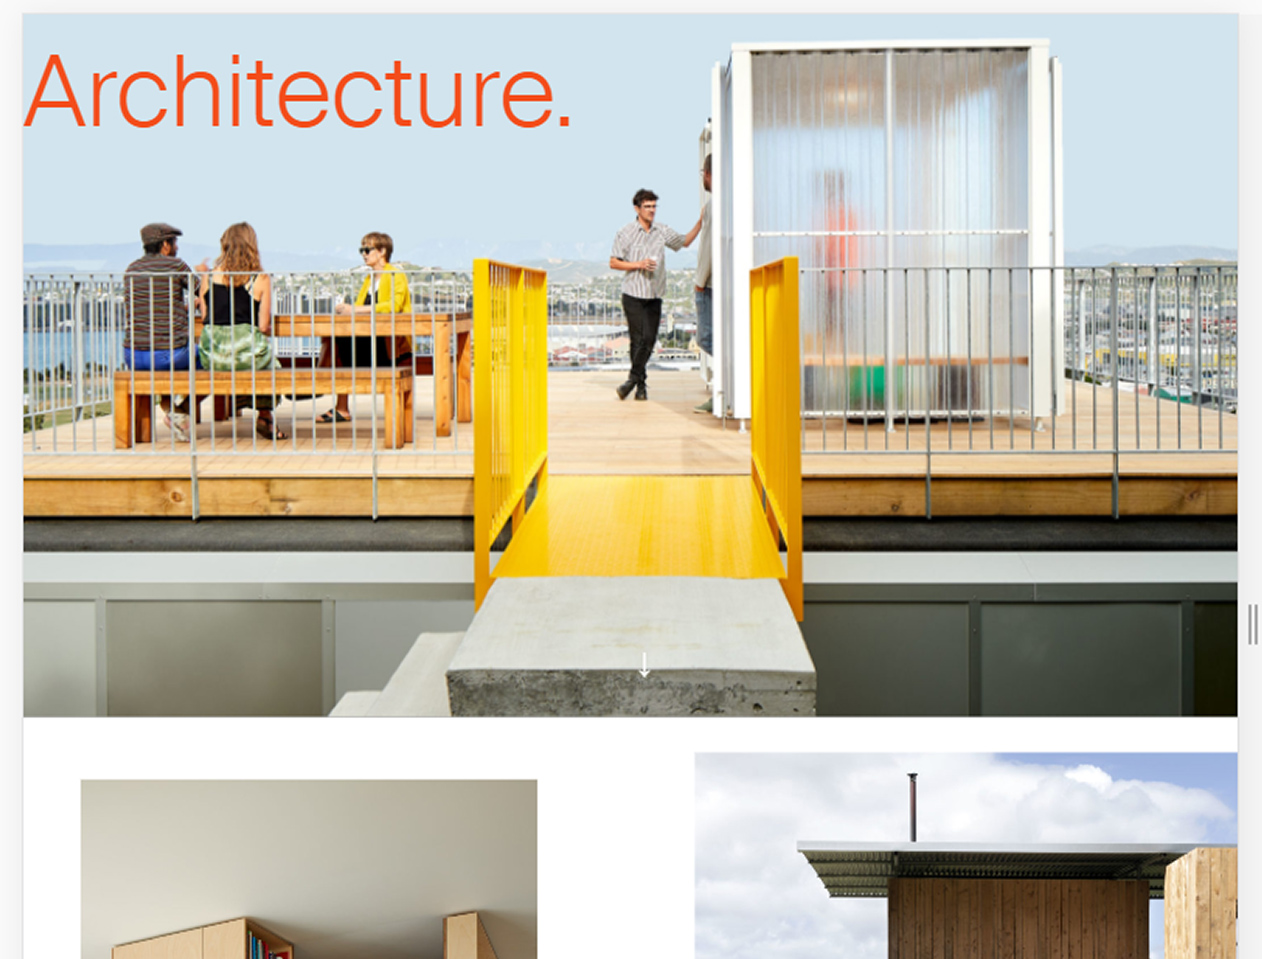 patchworkarchitecture.co.nz